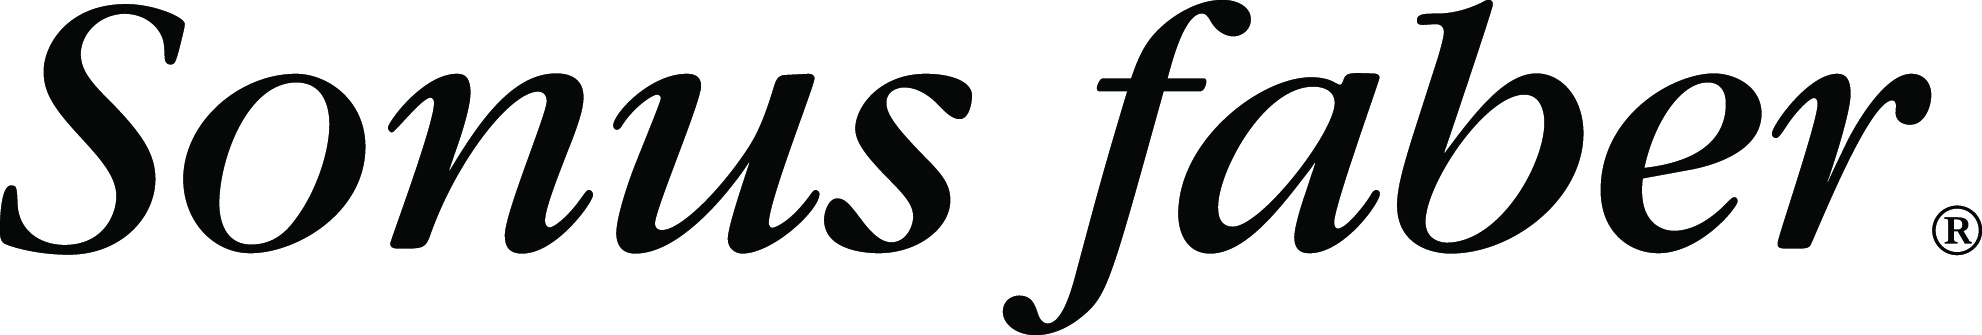 sonusfaber_logo_black.jpg